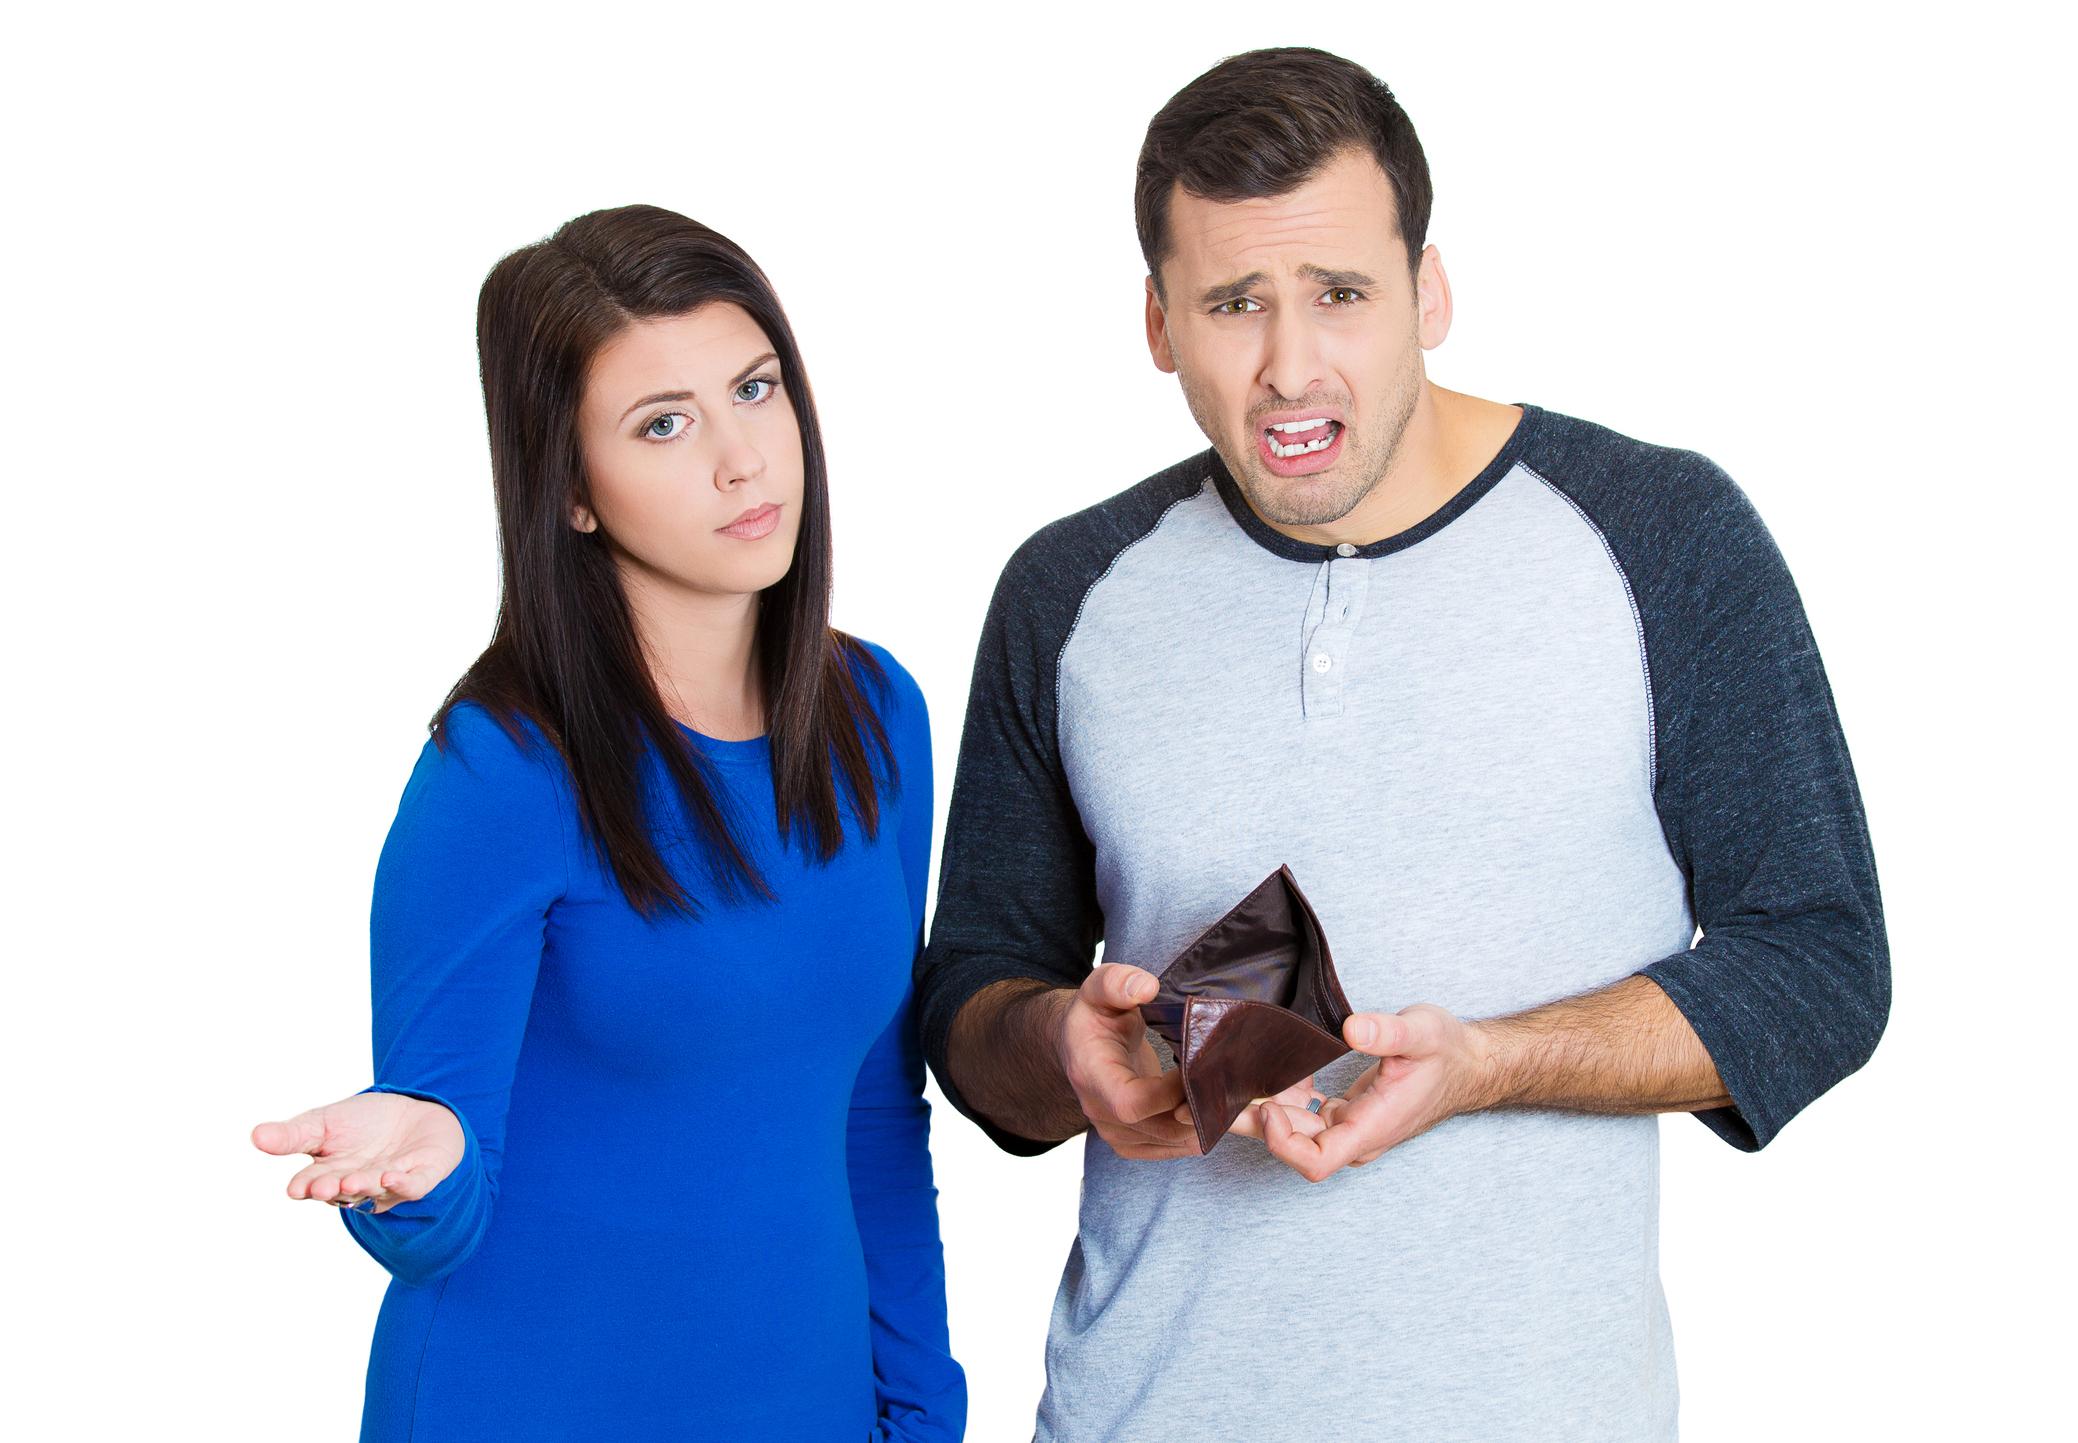 Millennial couple showing an open empty wallet.